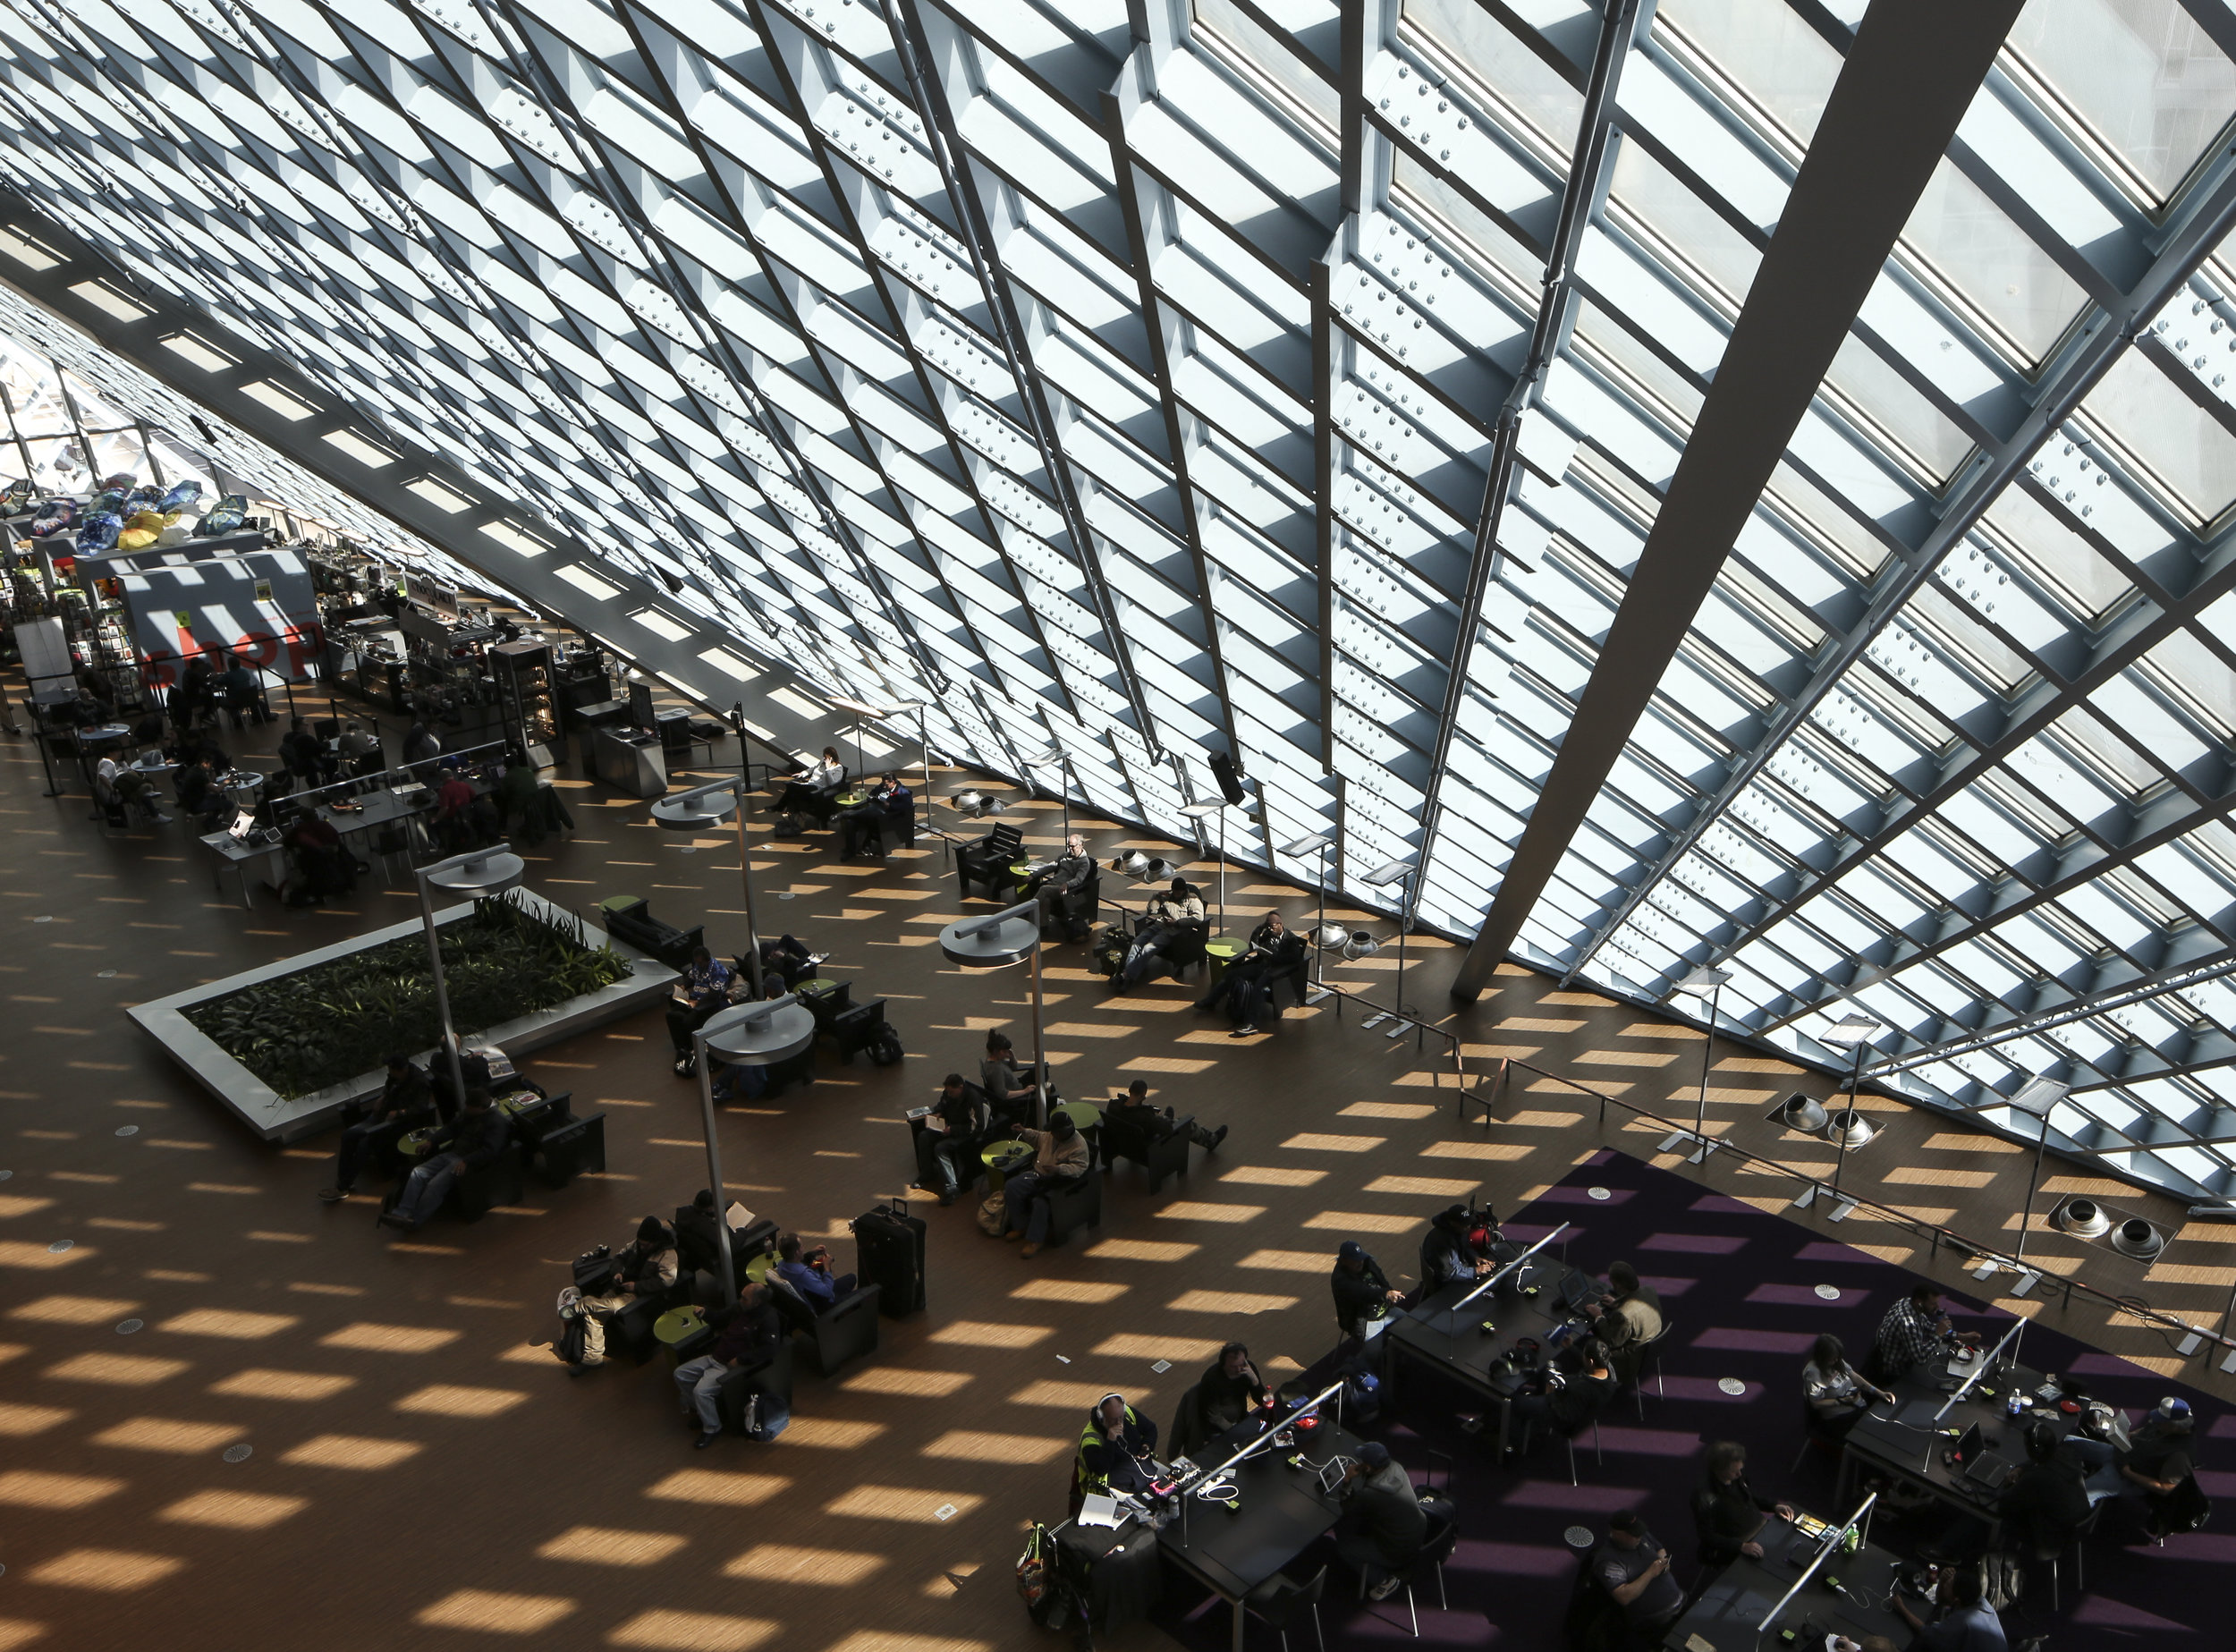 Seattle Central Library - Seattle, Washington - Rem Koolhaas, Joshua Prince-Ramus